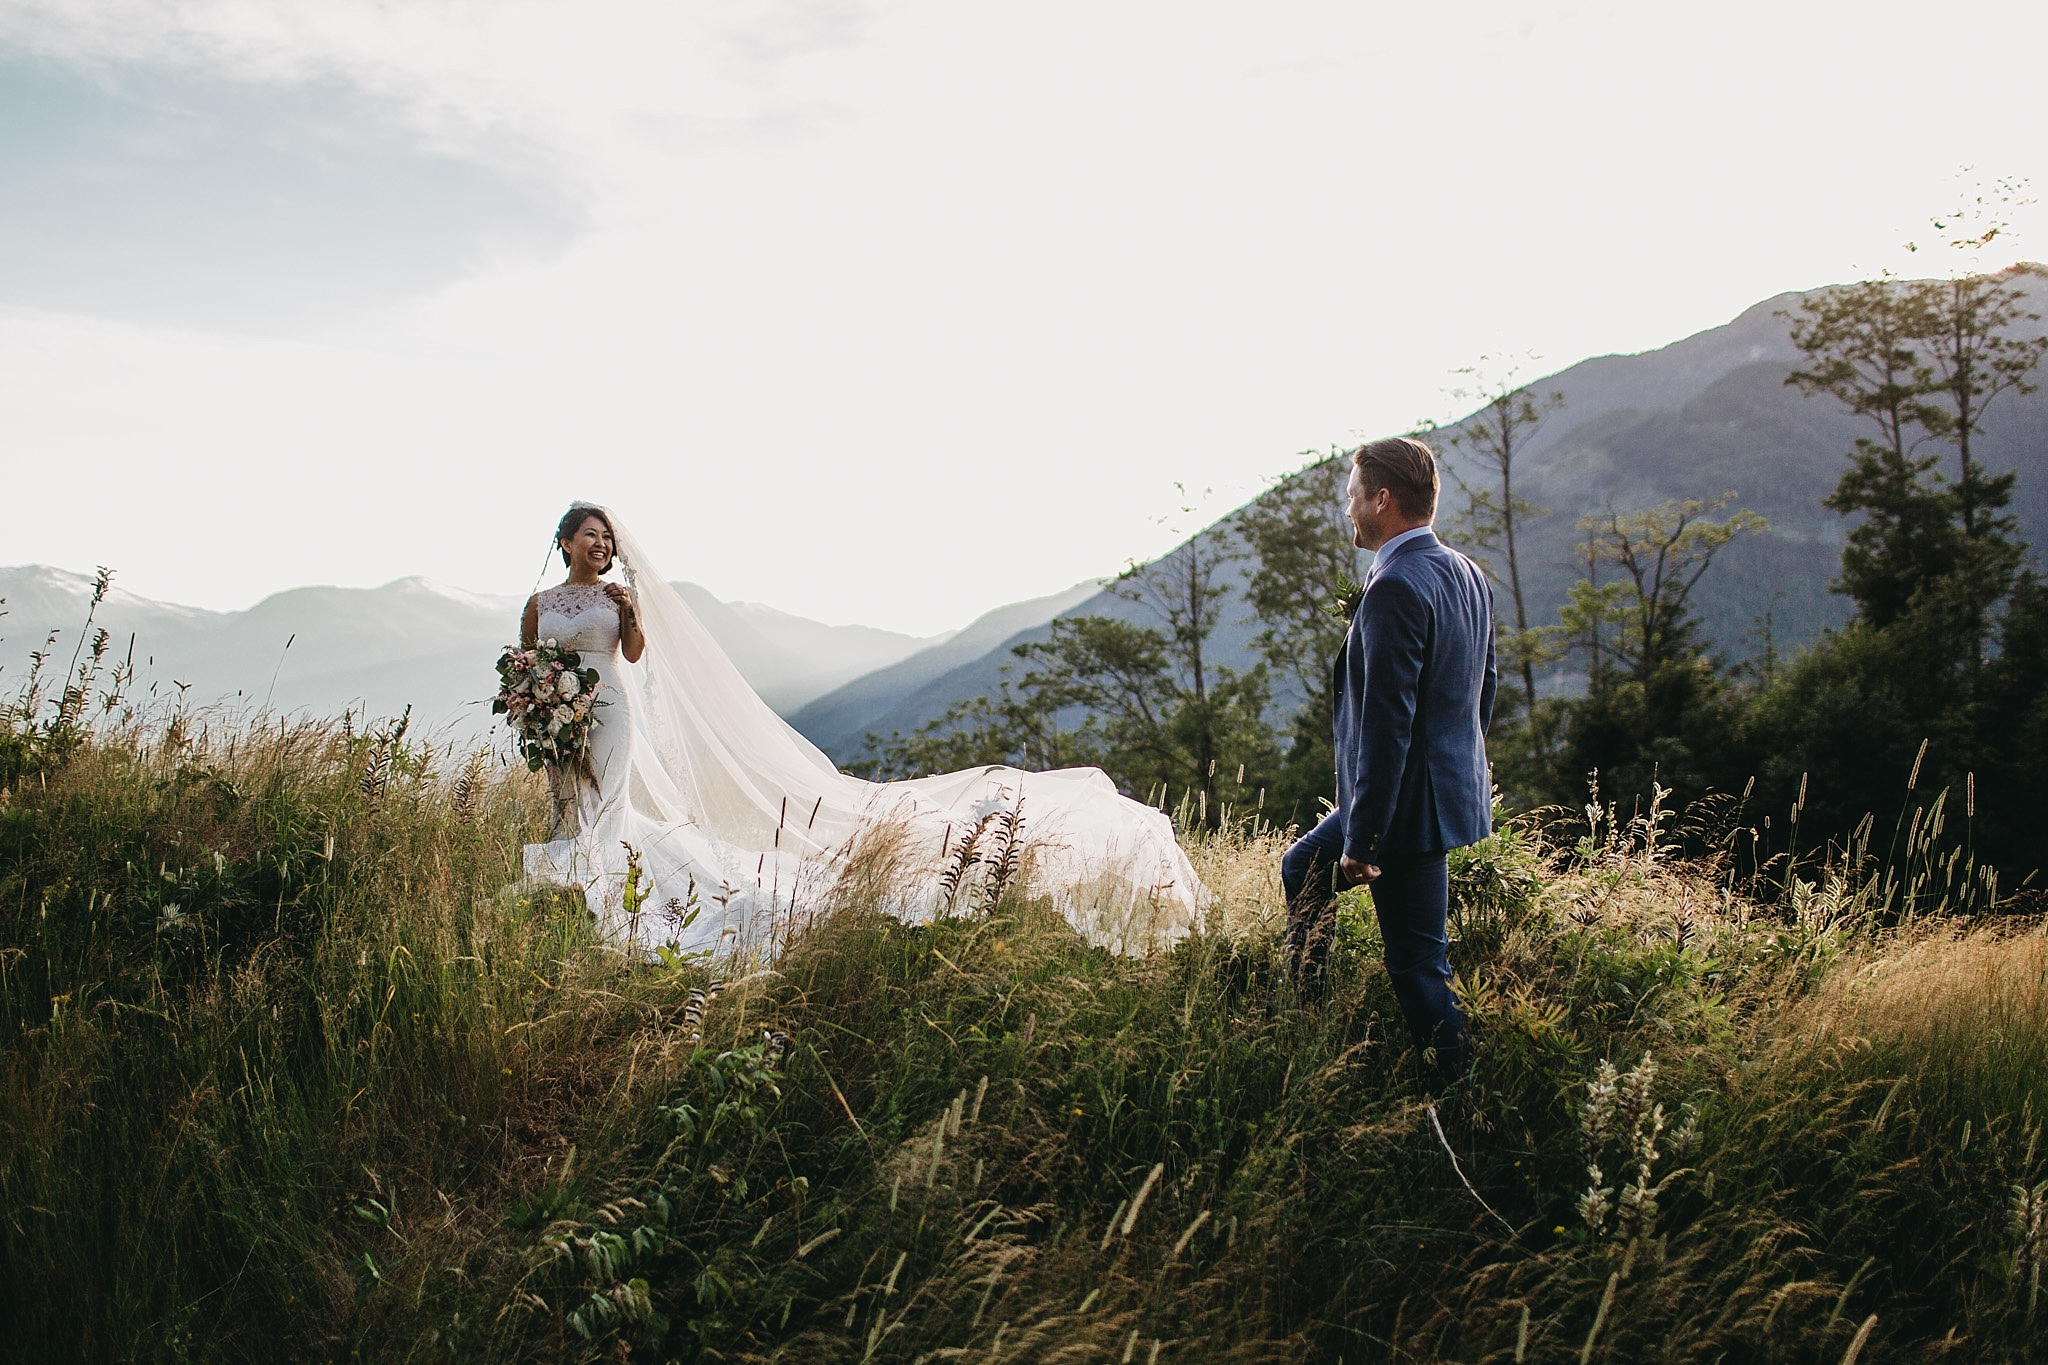 aileen-choi-photo-hart-house-wedding_0099.jpg